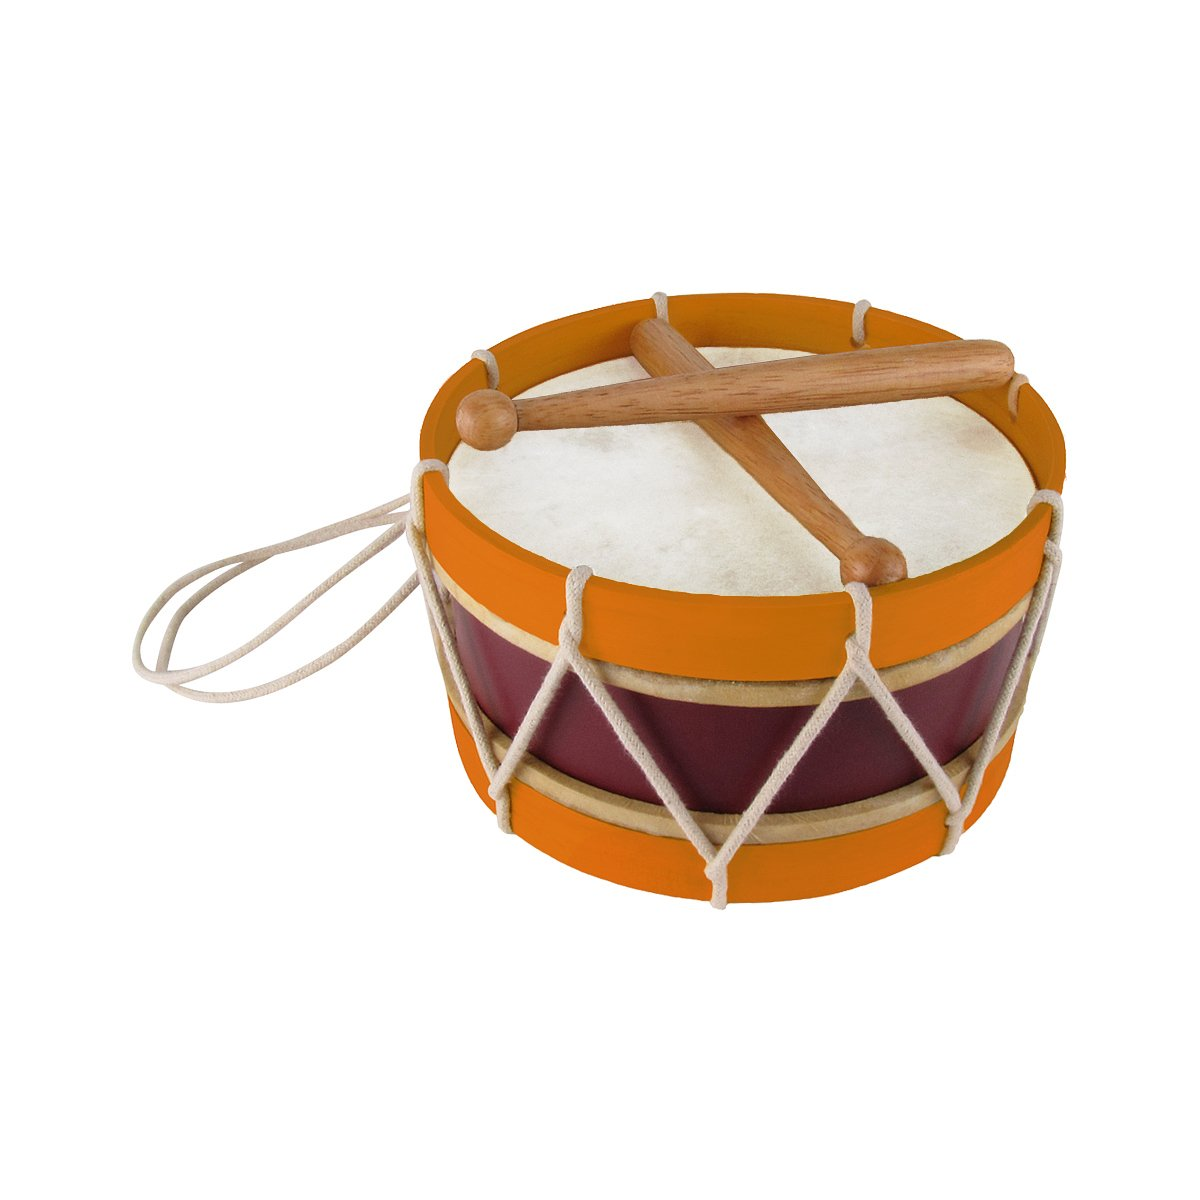 Revolutionary/Civil War Era Reproduction Marching Band Wooden Snare Drum by TreasureGurus, LLC